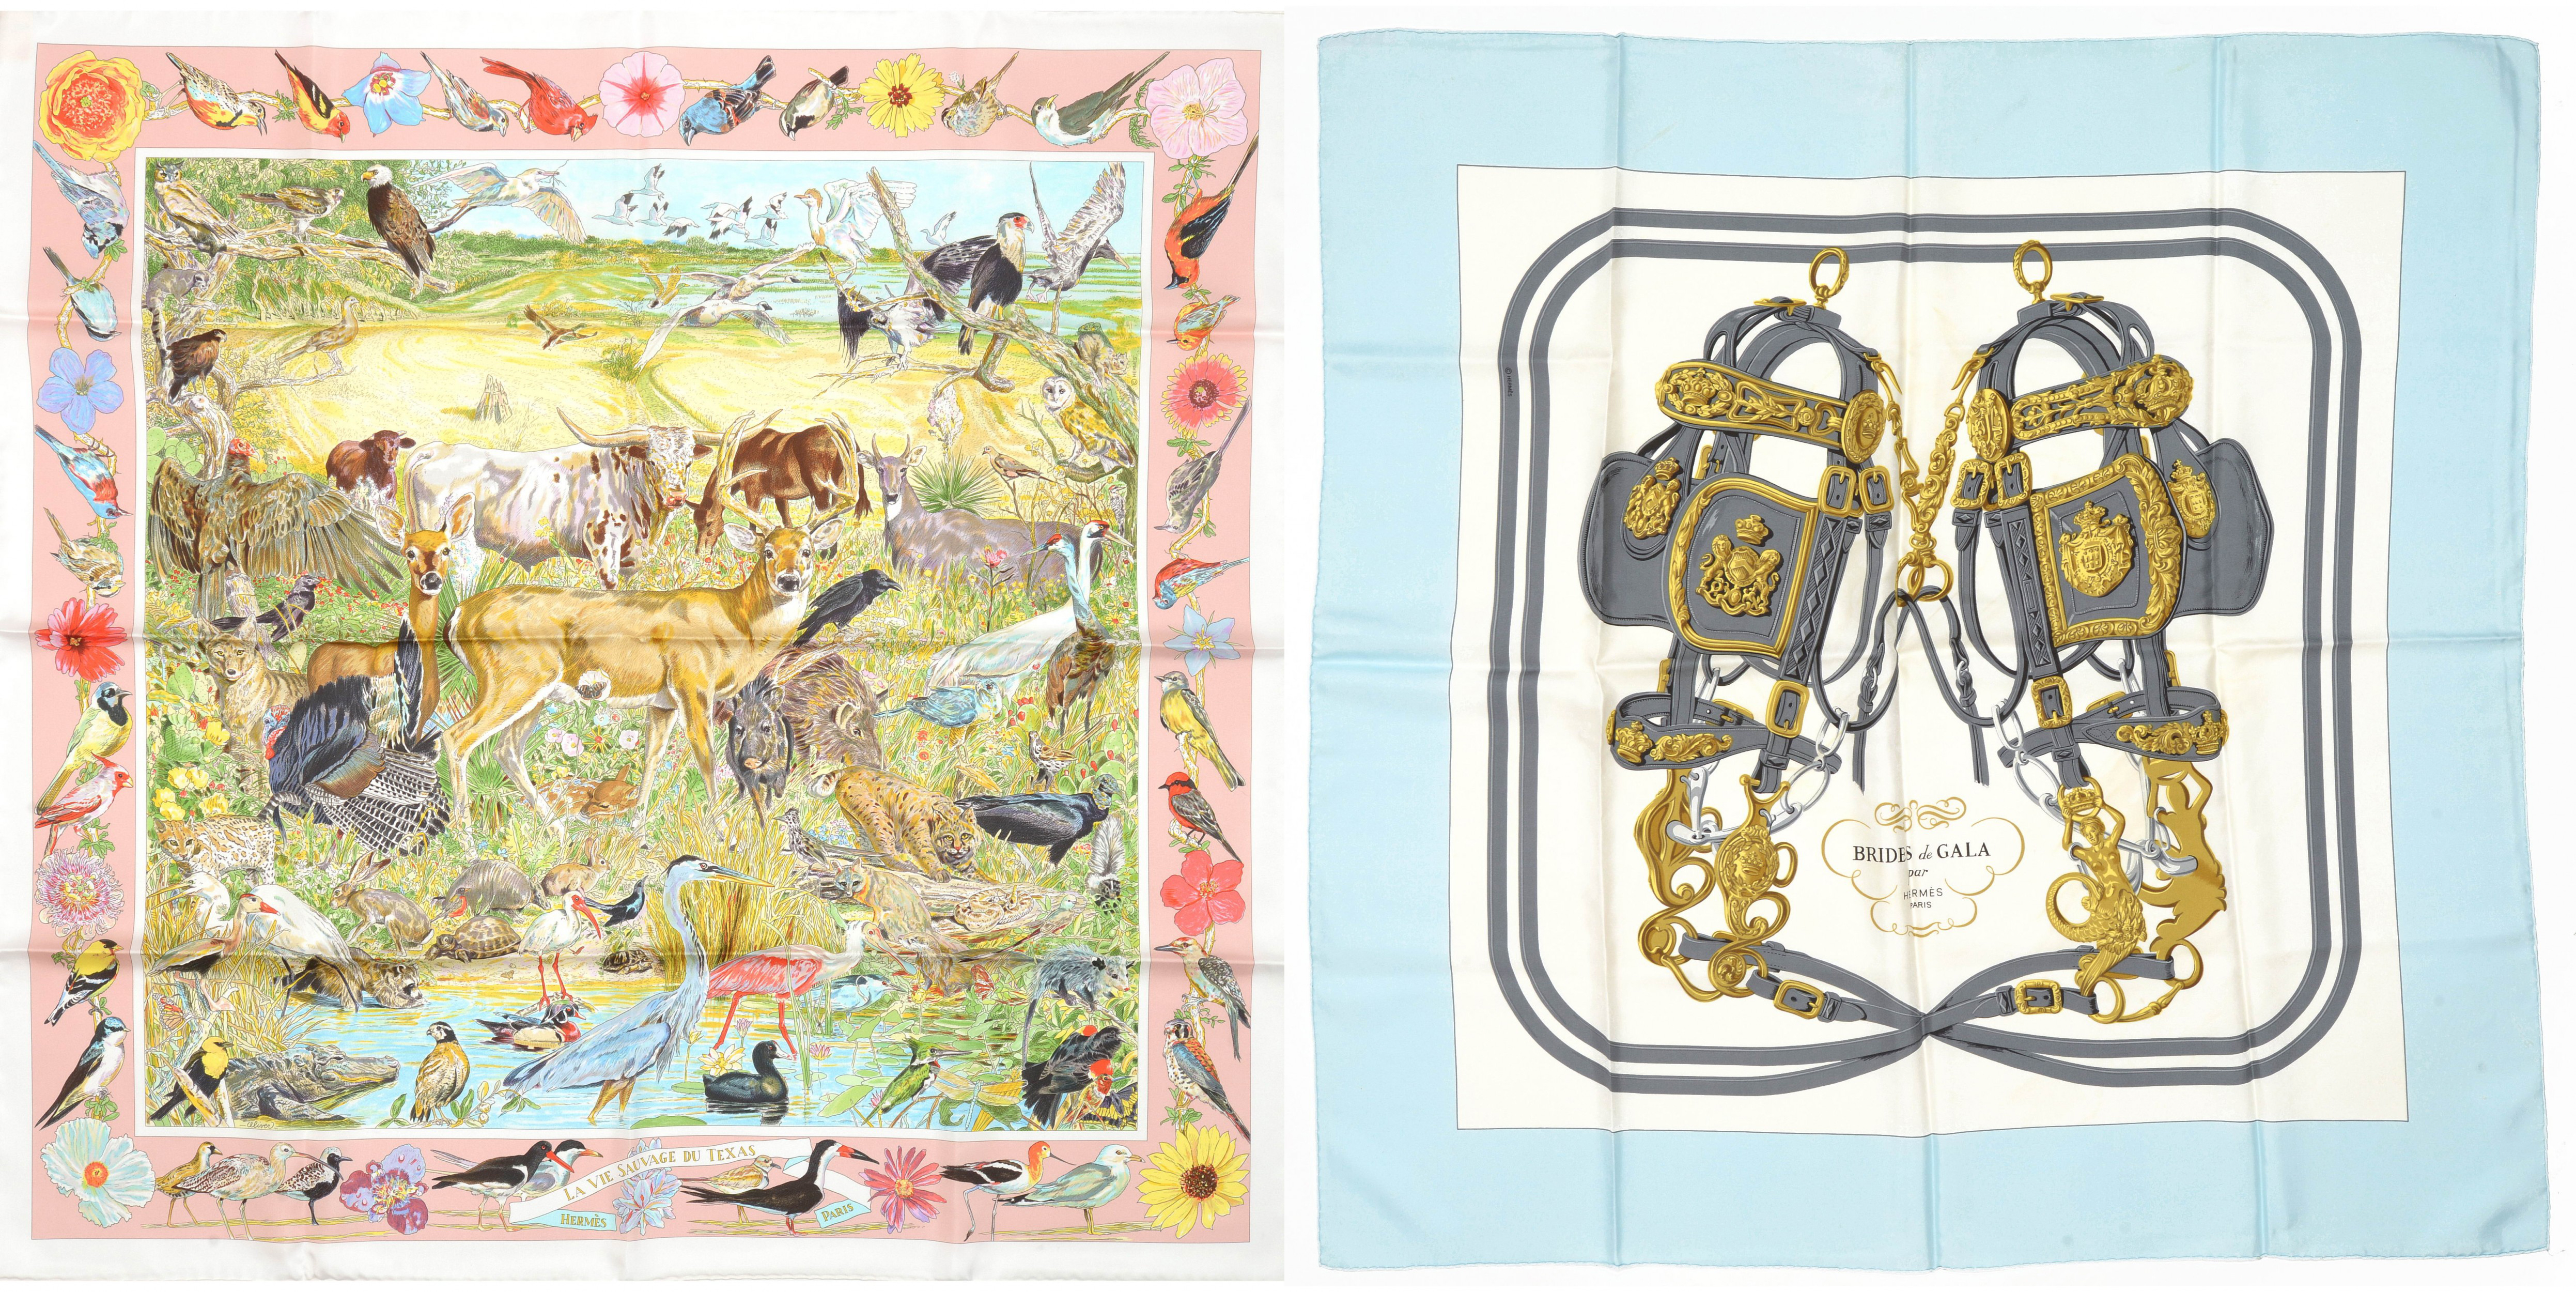 Hemrès carrés, 'Texas Wildlife' and 'Brides de Gala'. Image: HVMC